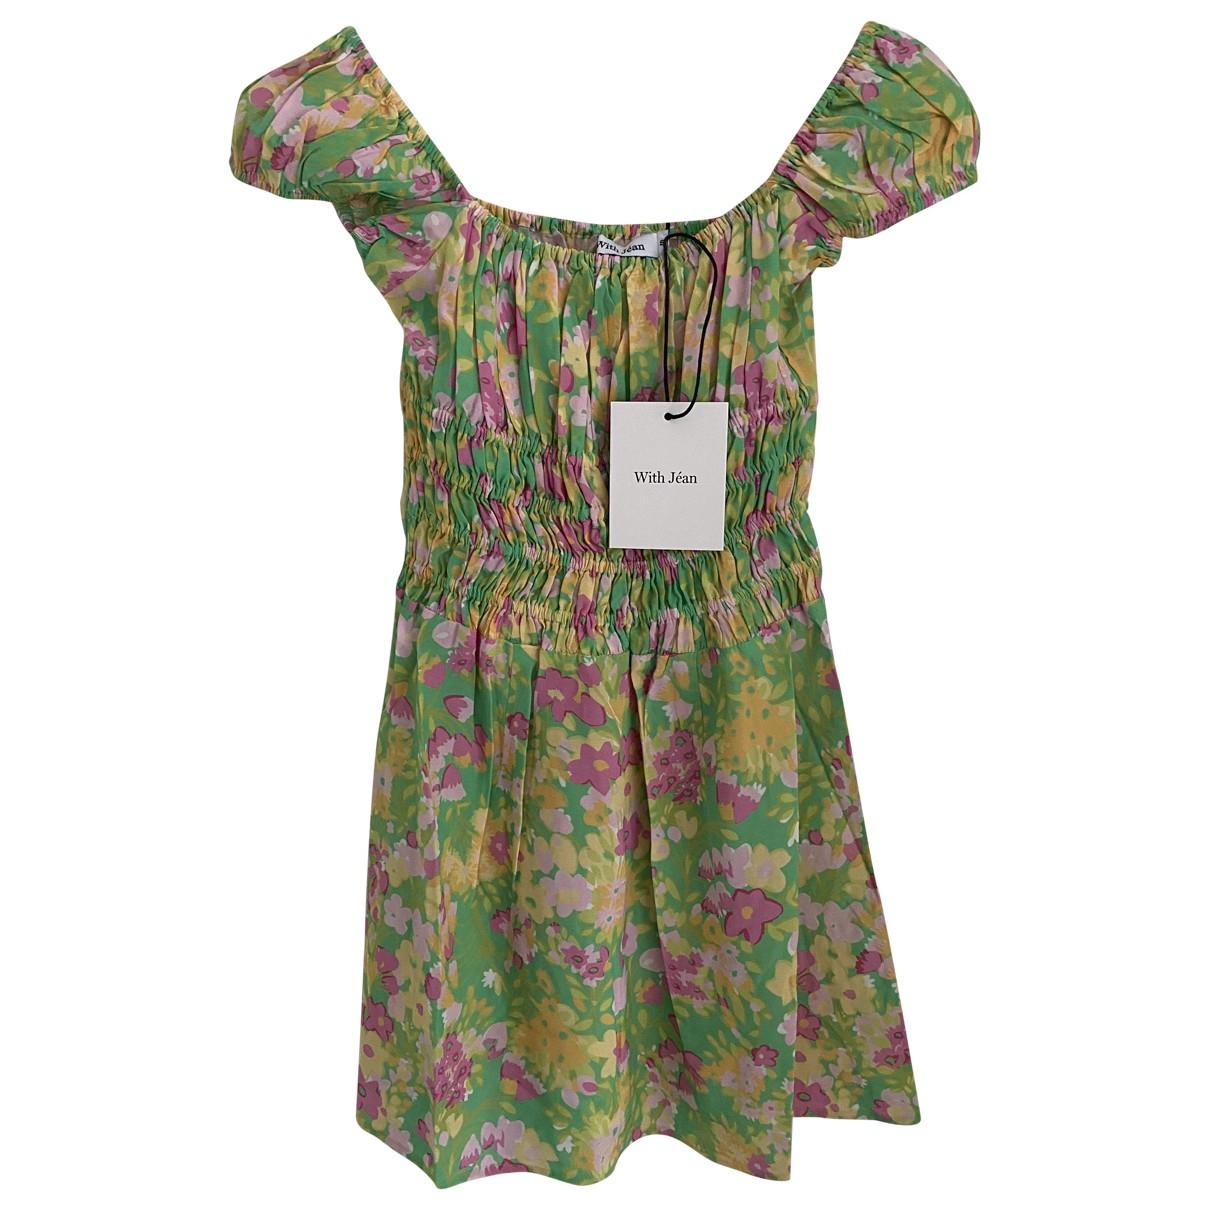 With Jéan \N Green dress for Women S International